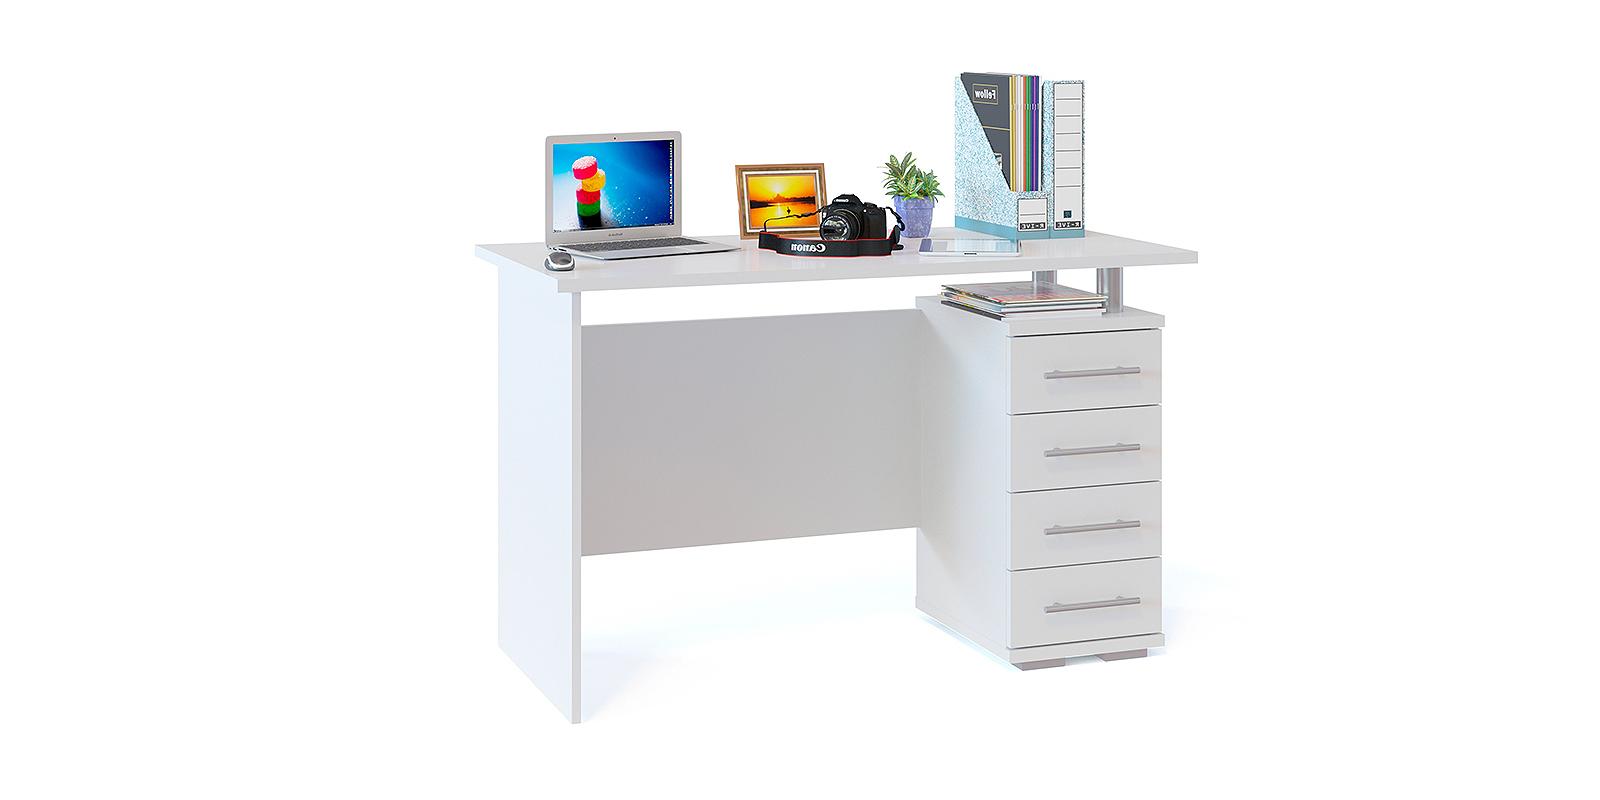 Стол компьютерный HomeMe Сноу AFU0053000